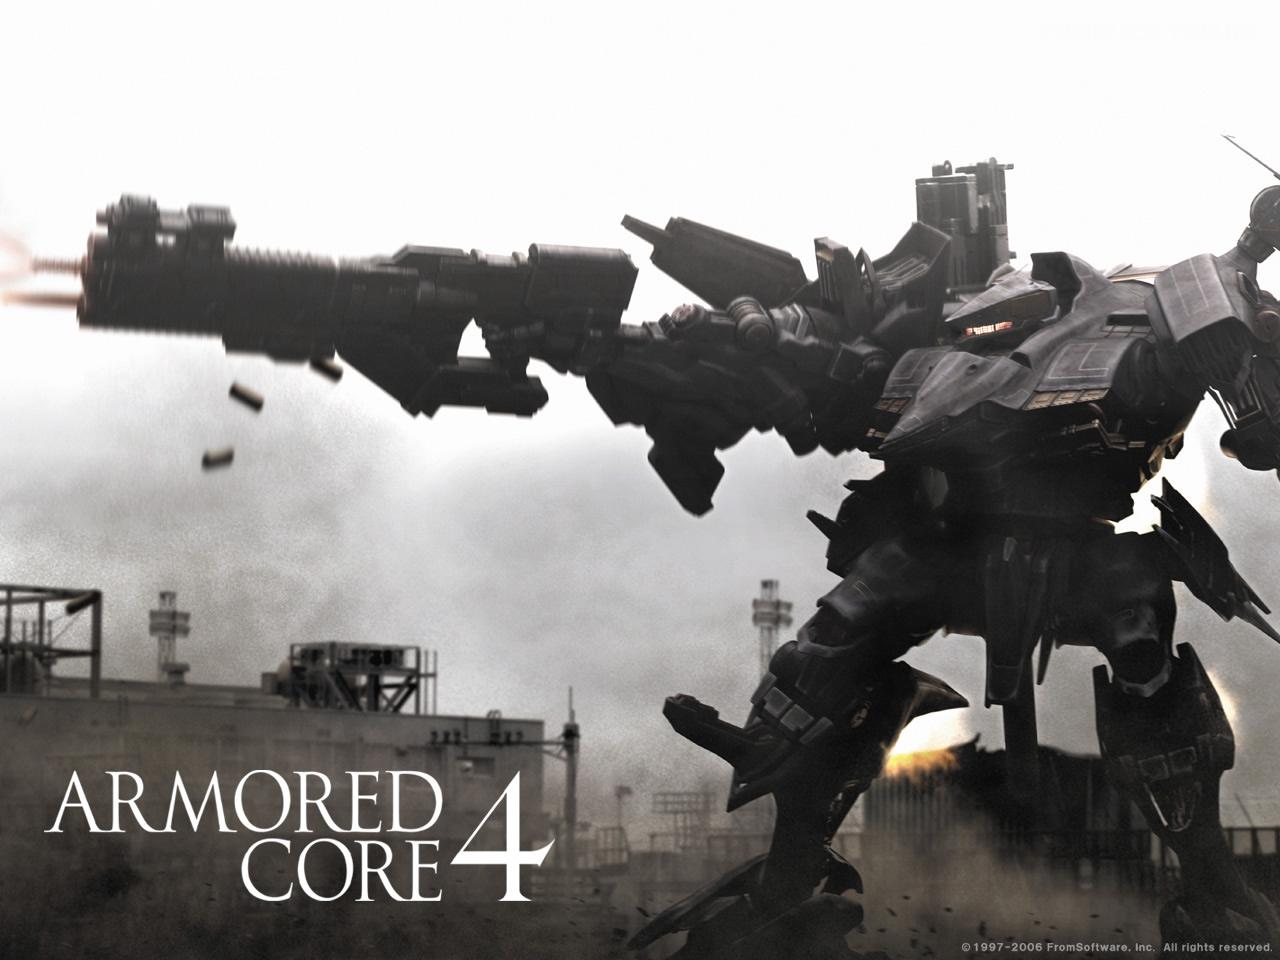 General 1280x960 Armored Core mech robot